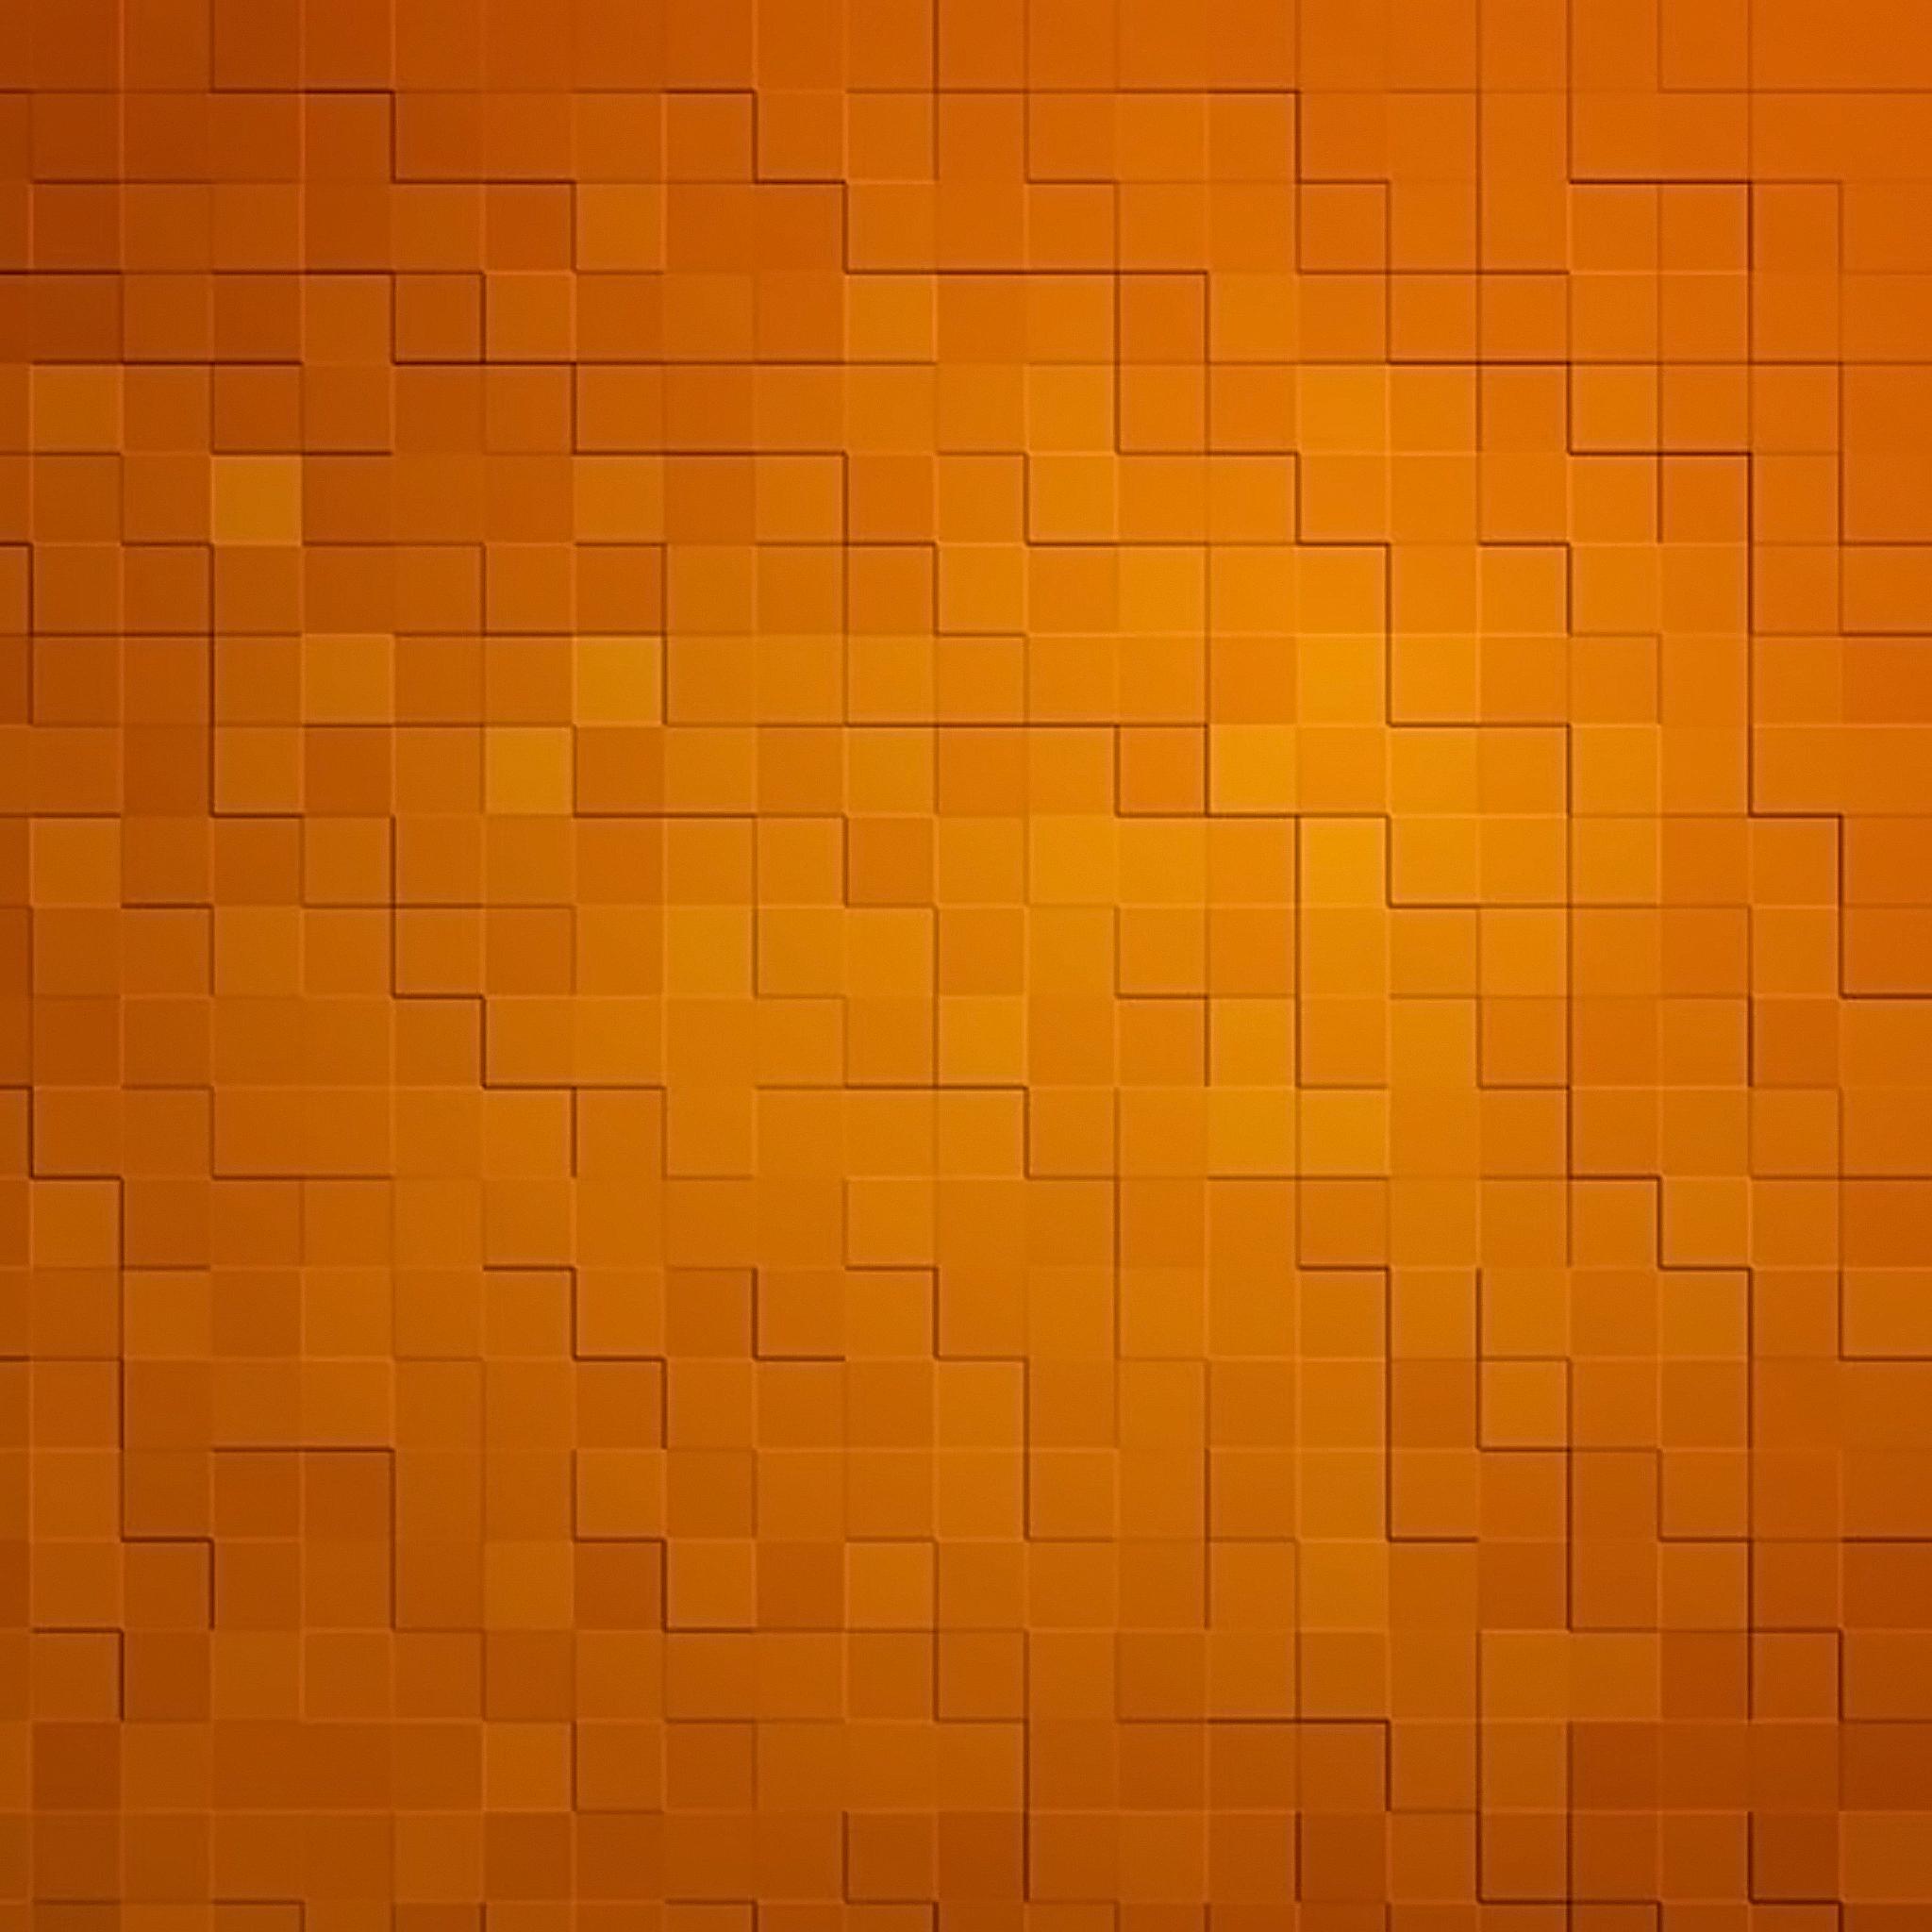 Orange Wallpaper Hd: IPad Retina Display Wallpapers